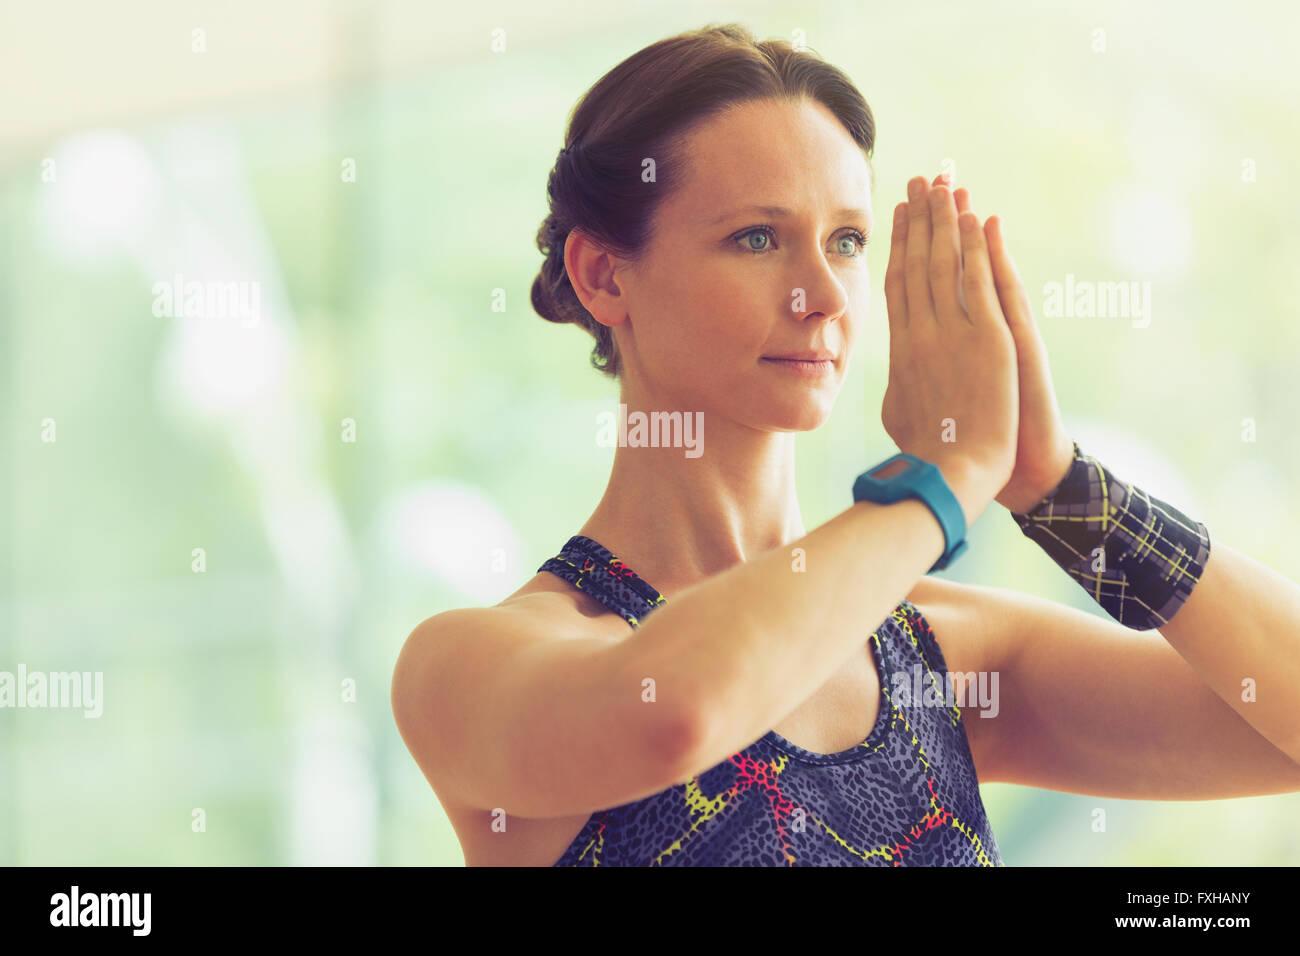 Ruhige Frau mit Händen an Gebet Position im Yoga-Kurs Stockbild